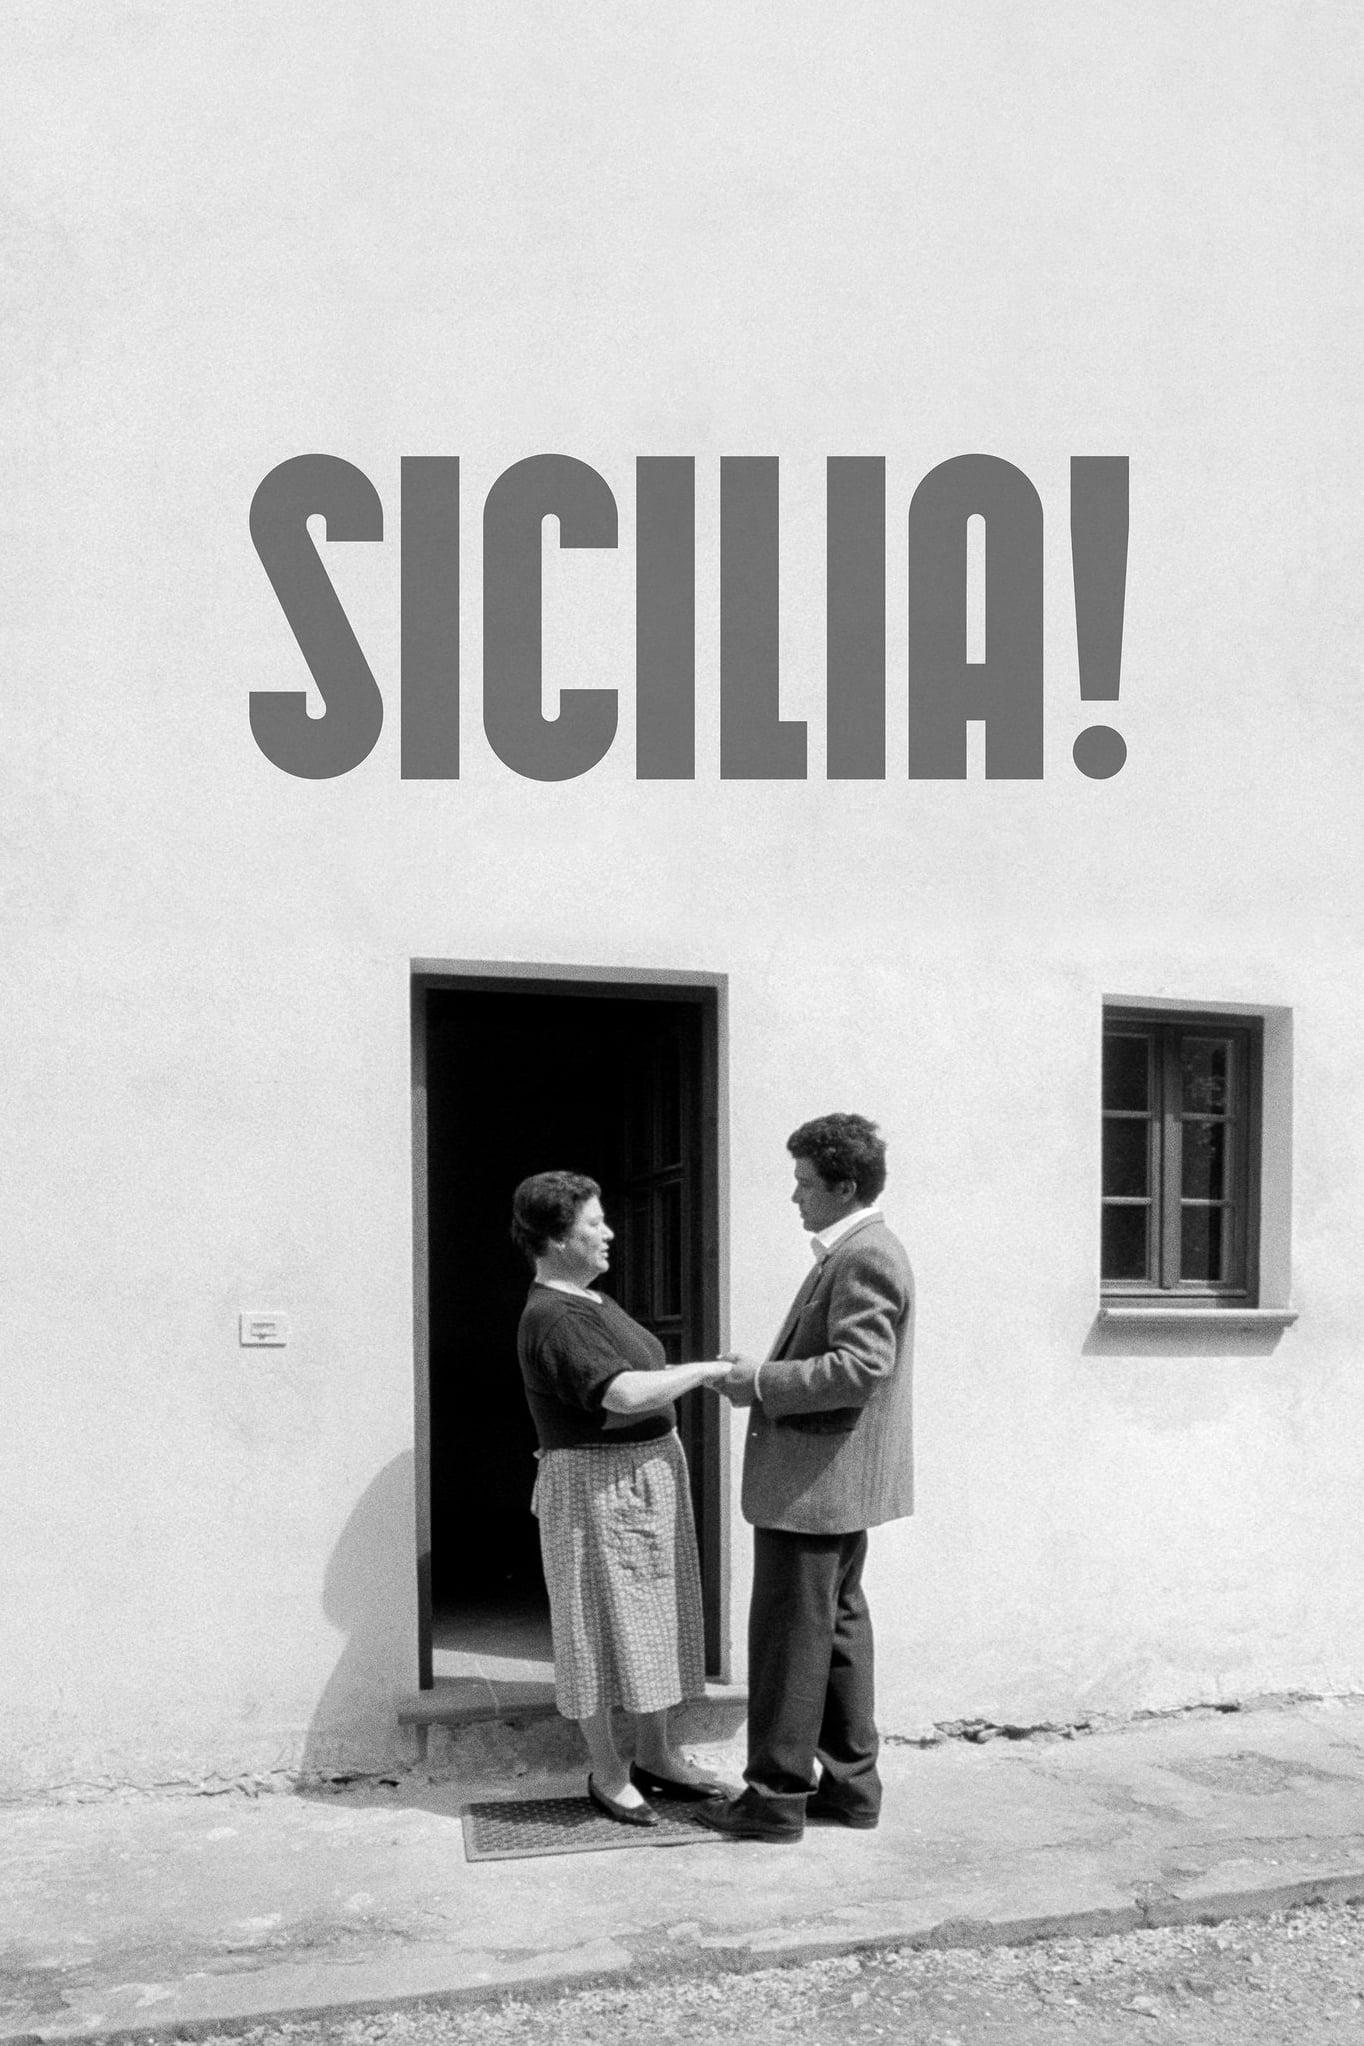 Sicily!